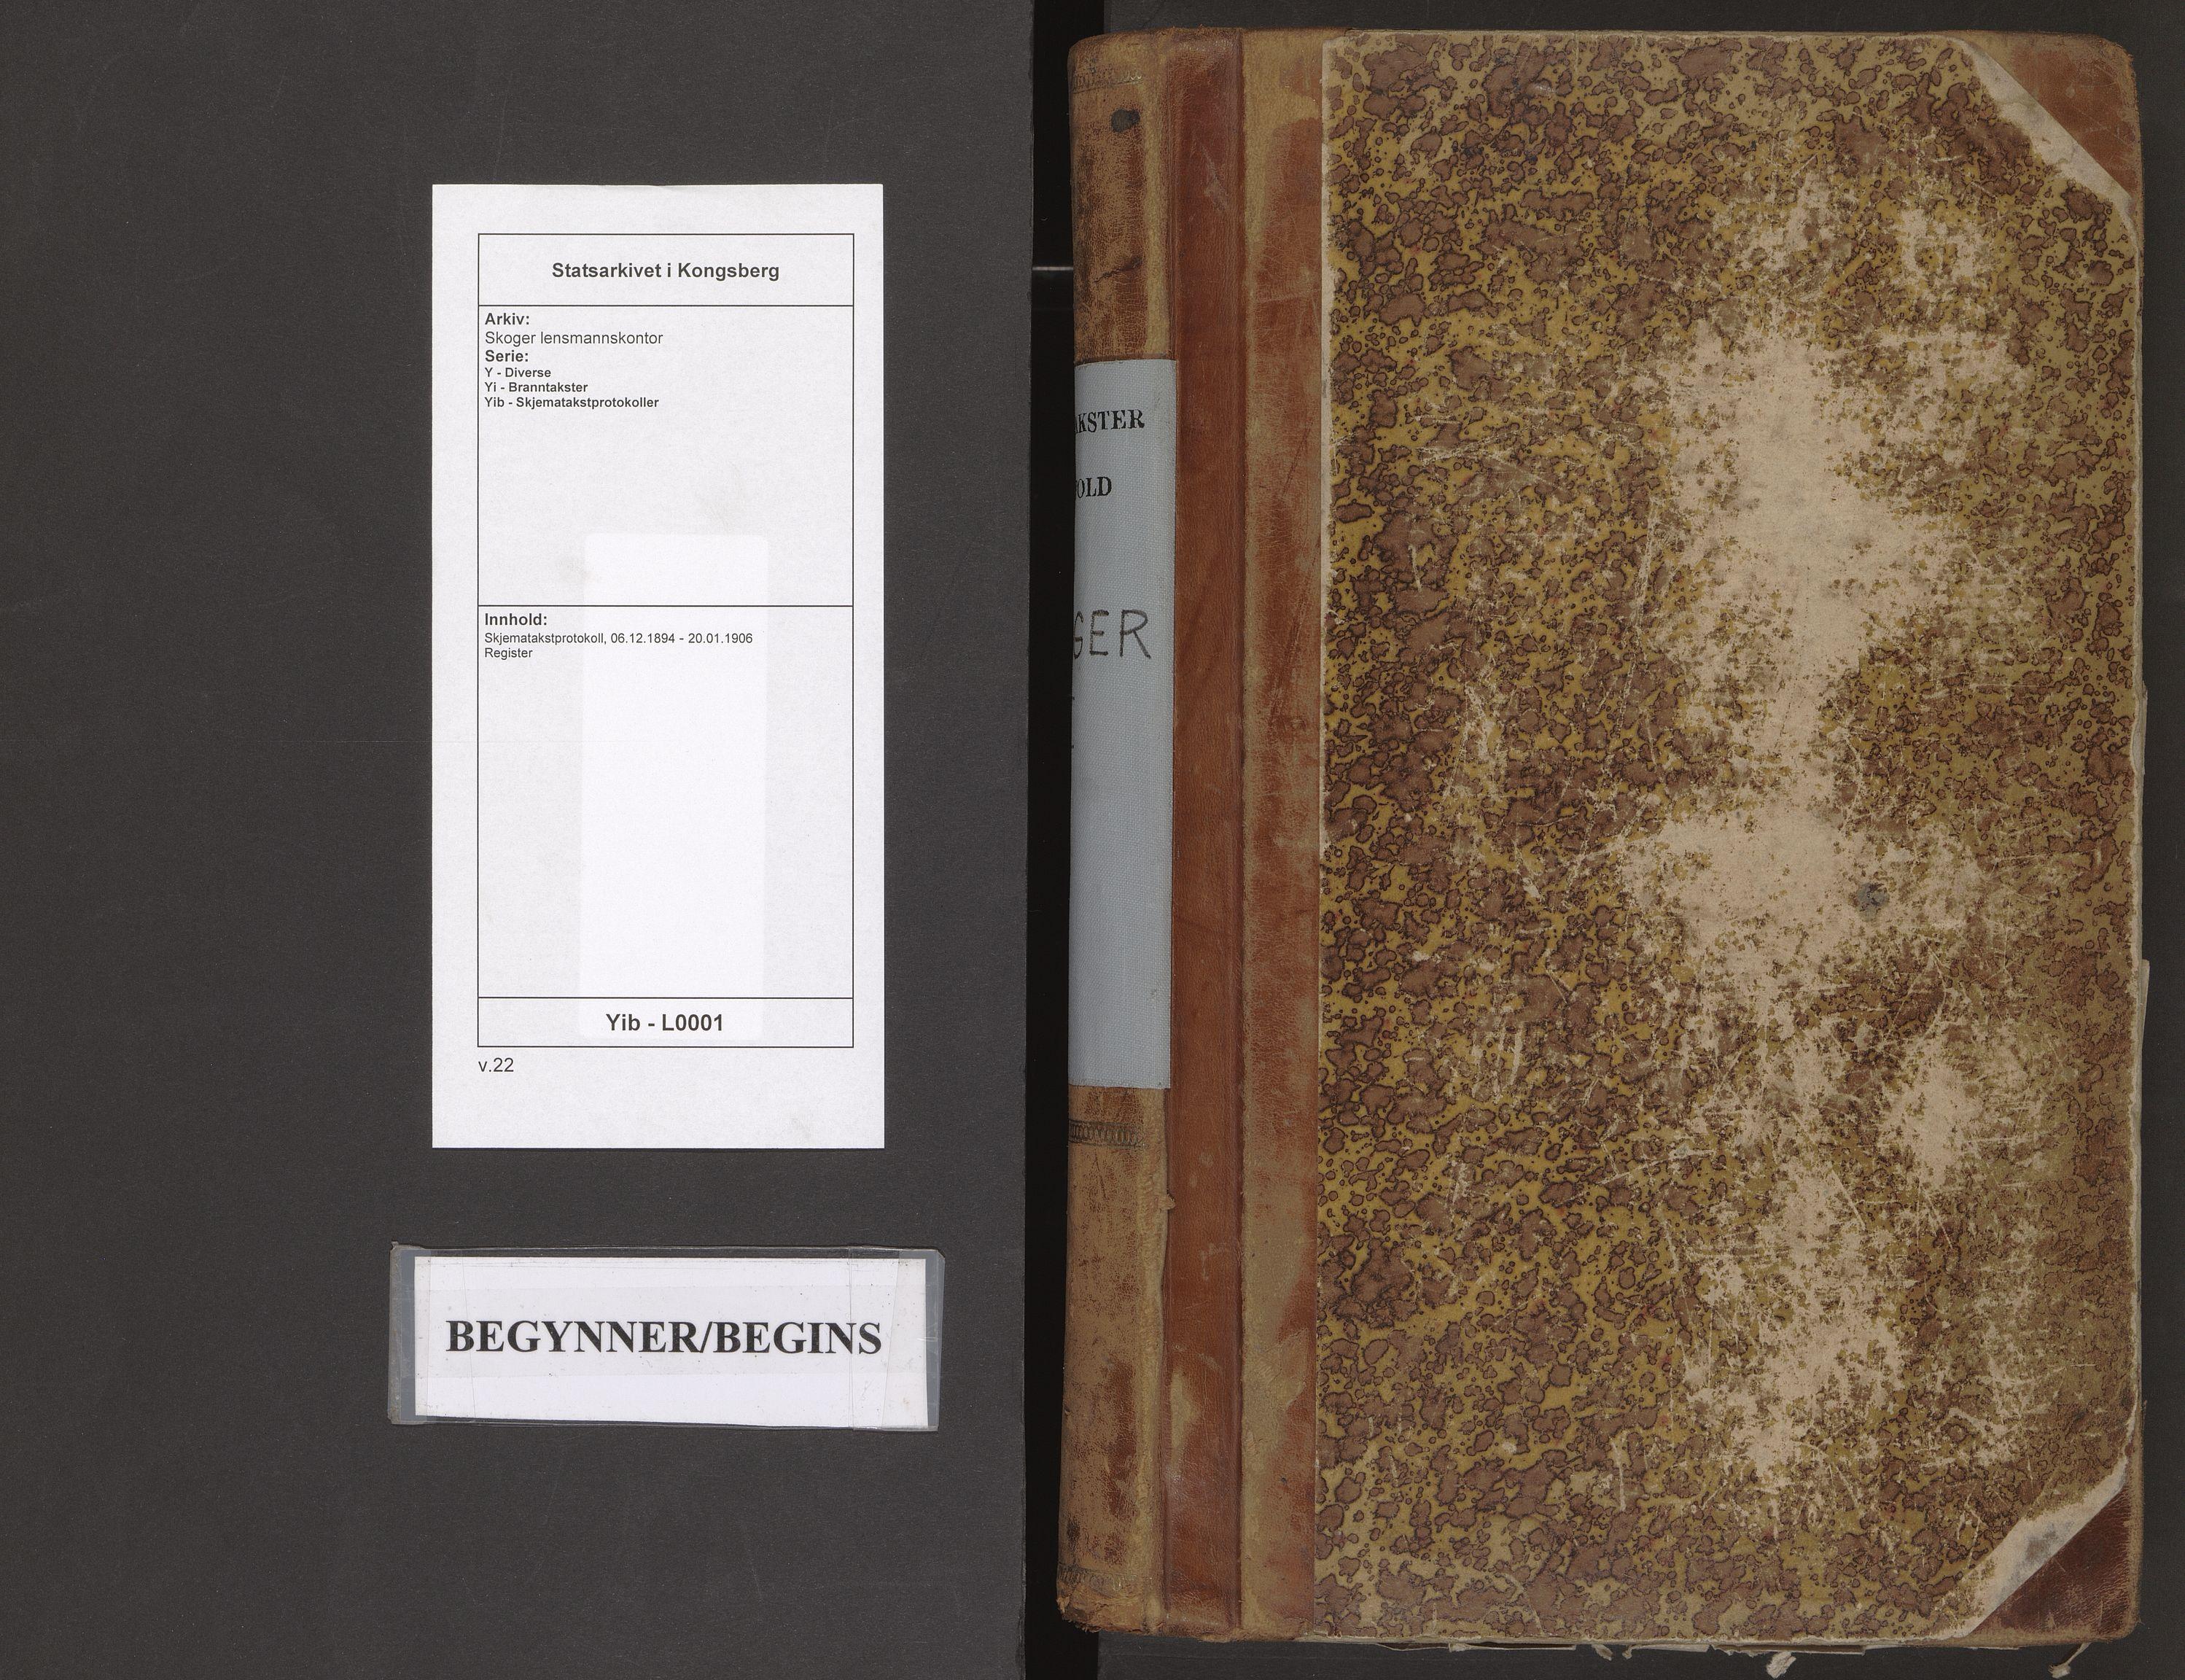 SAKO, Skoger lensmannskontor, Y/Yi/Yib/L0001: Skjematakstprotokoll, 1894-1906